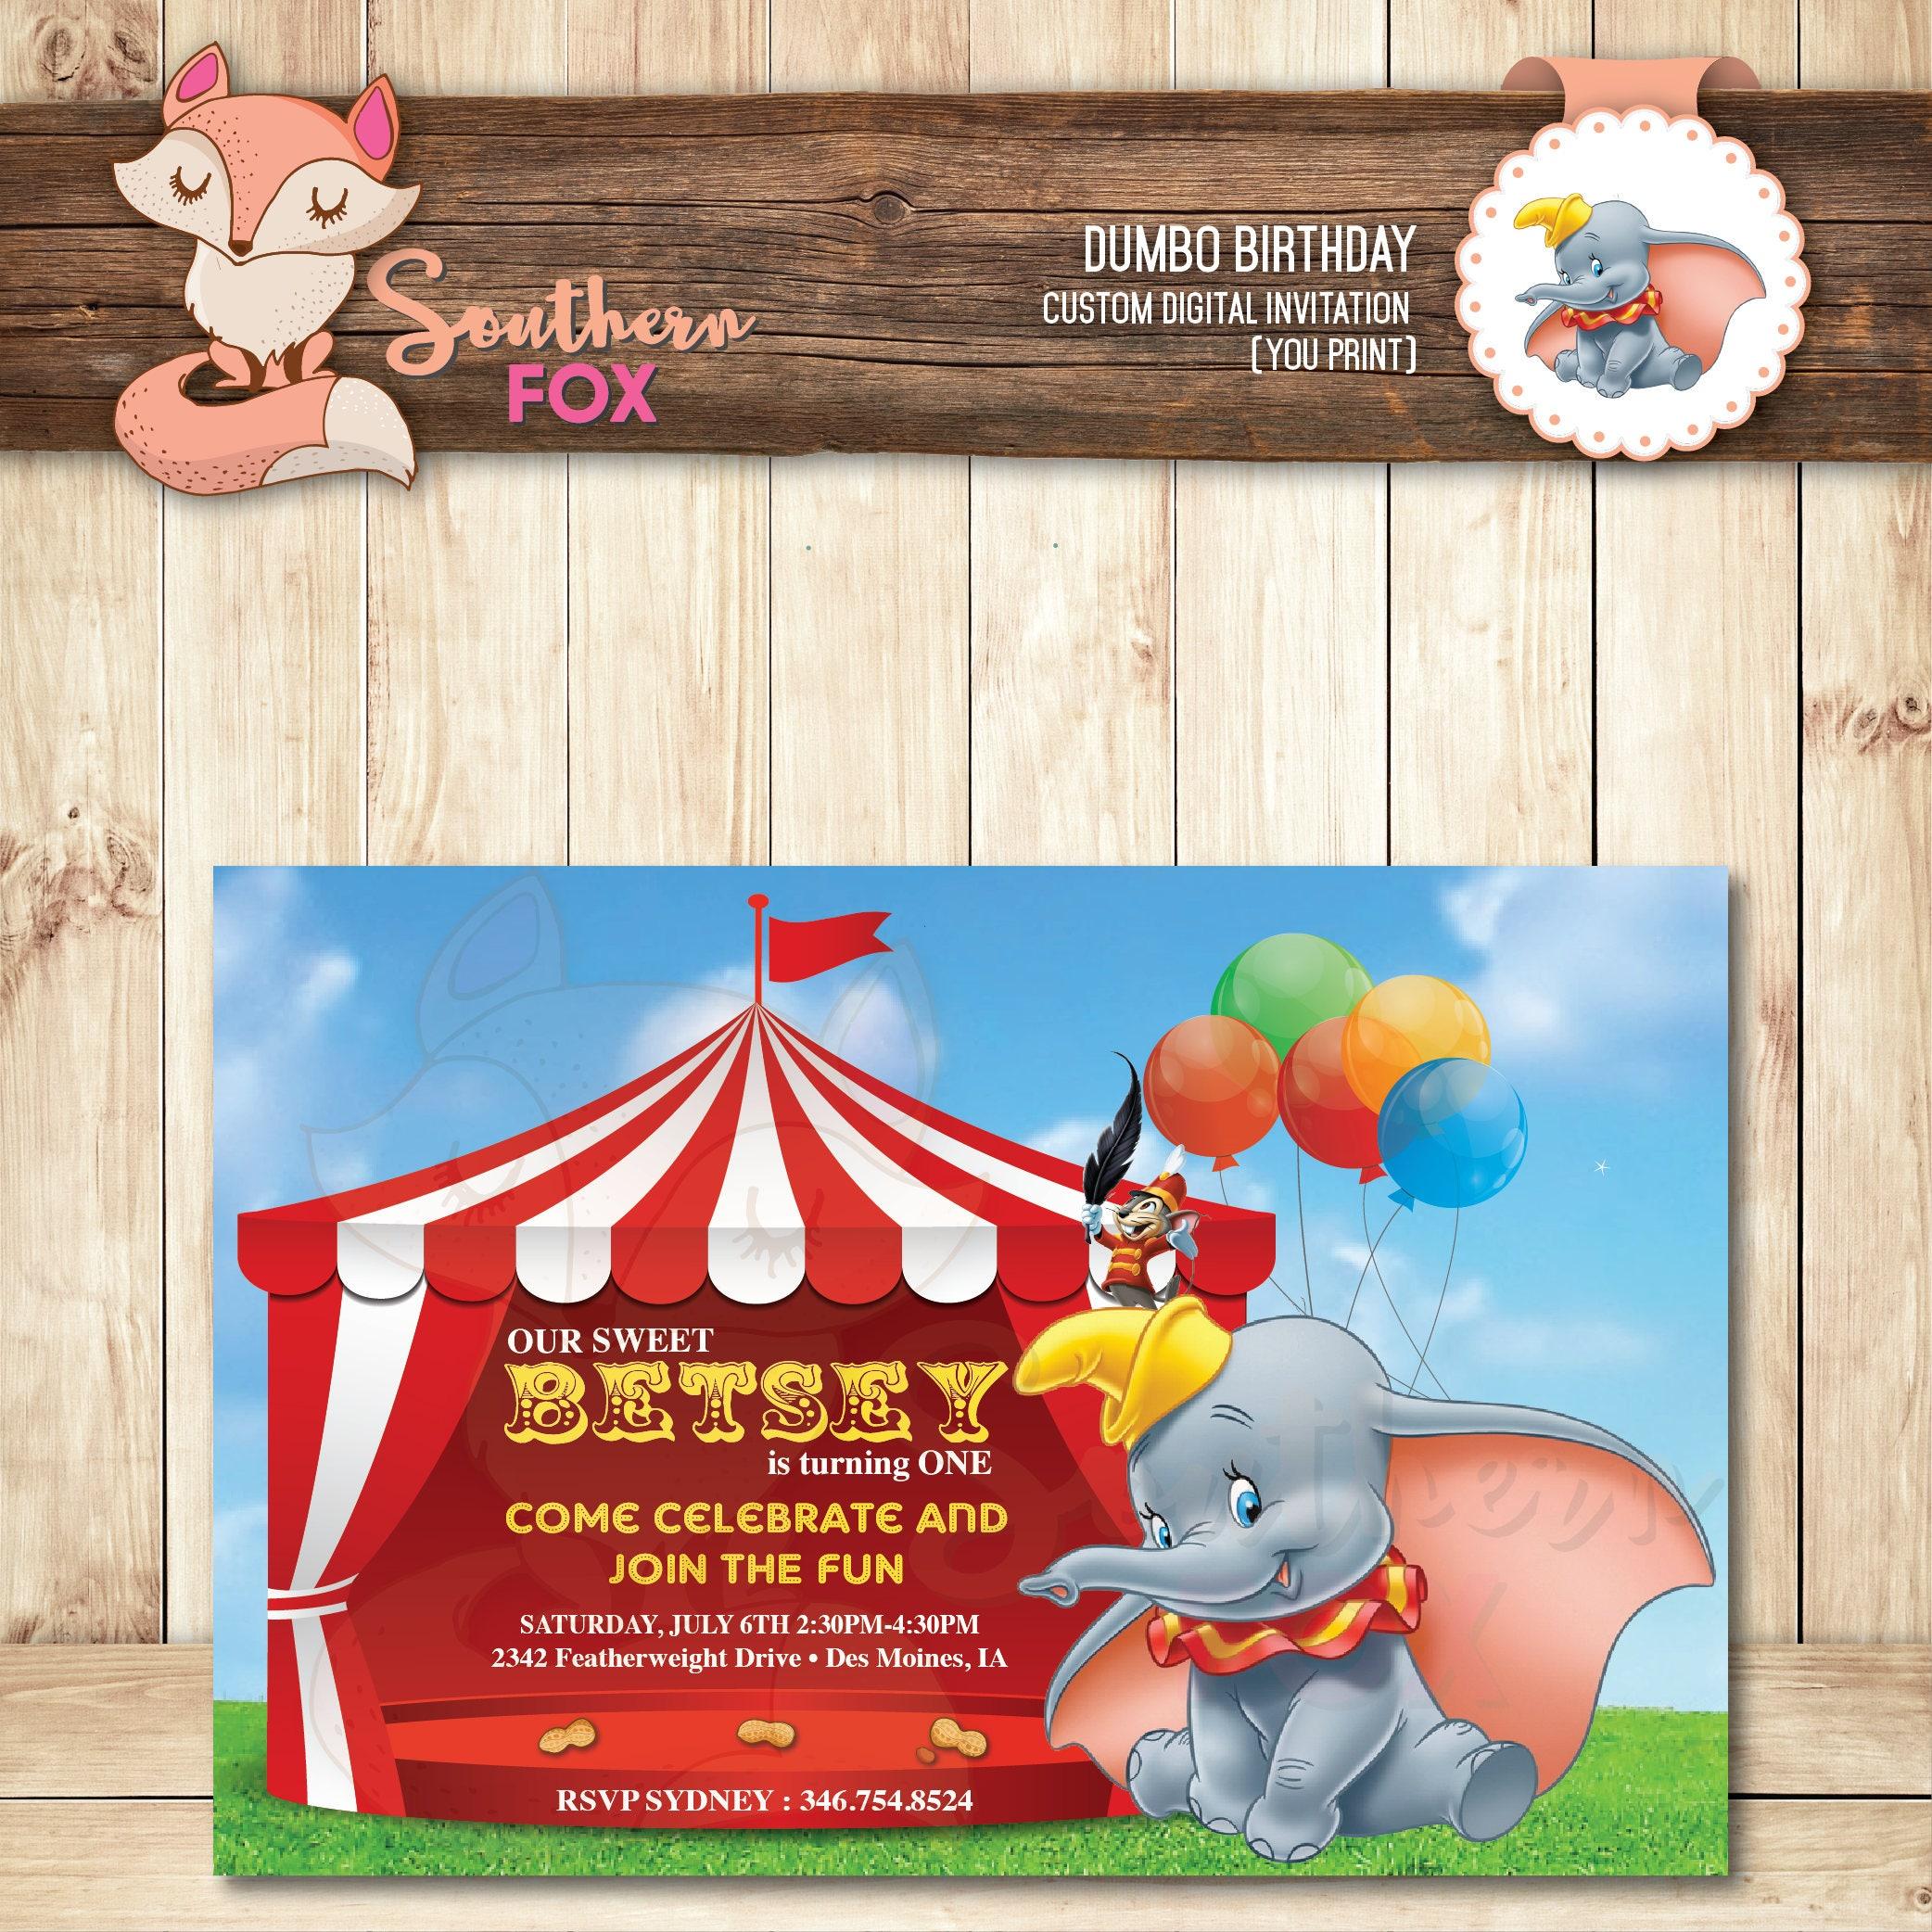 Dumbo Birthday Invitation Digital Birthday Invitation-Dumbo | Etsy